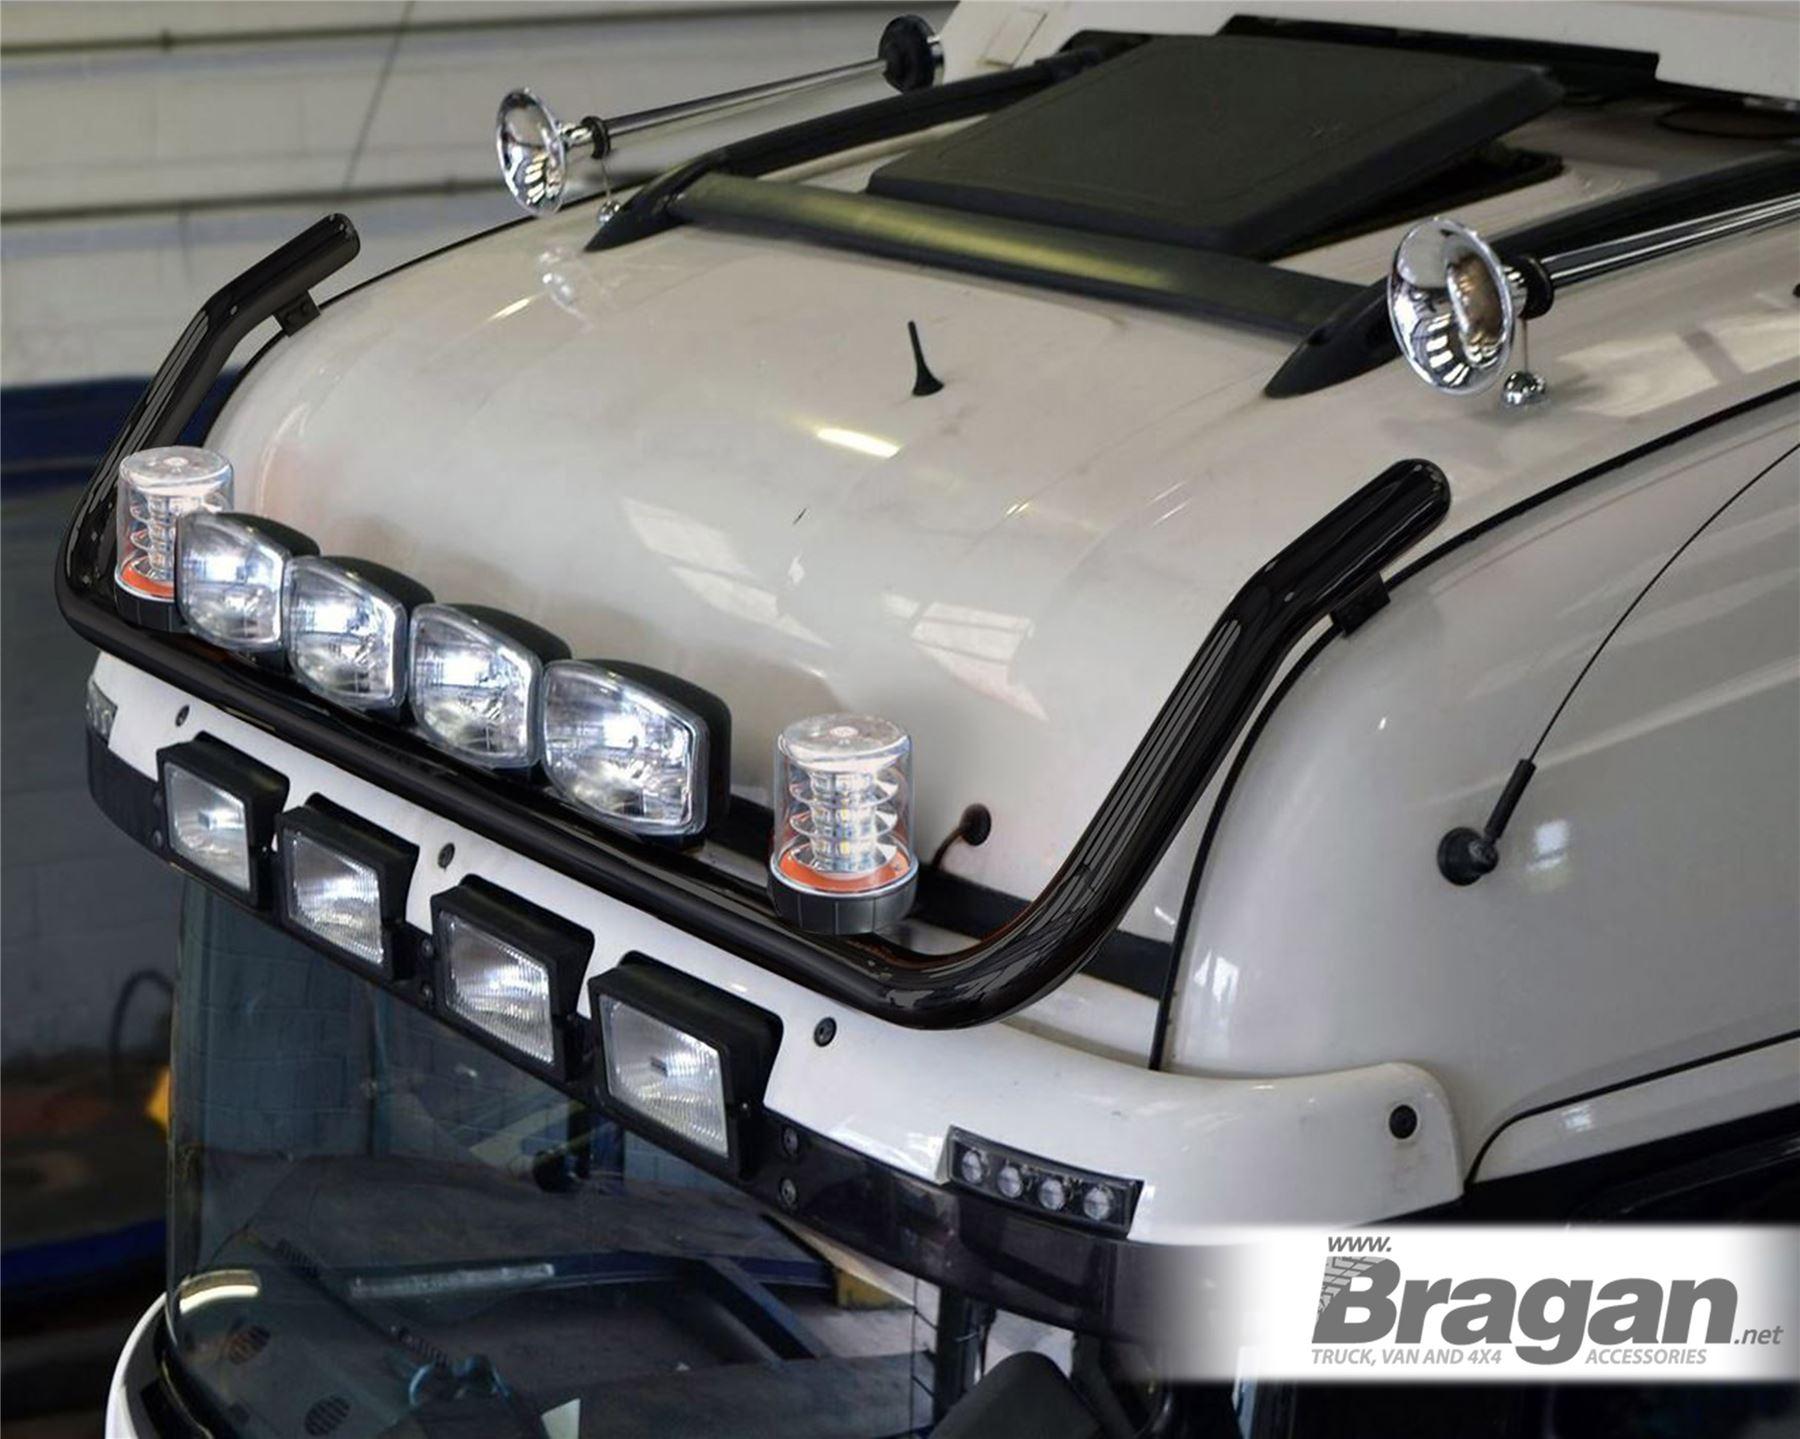 Pactrade Marine 2PCS Boat RV Car Bus Truck Blue LED Accent Light 12V Trim Ring